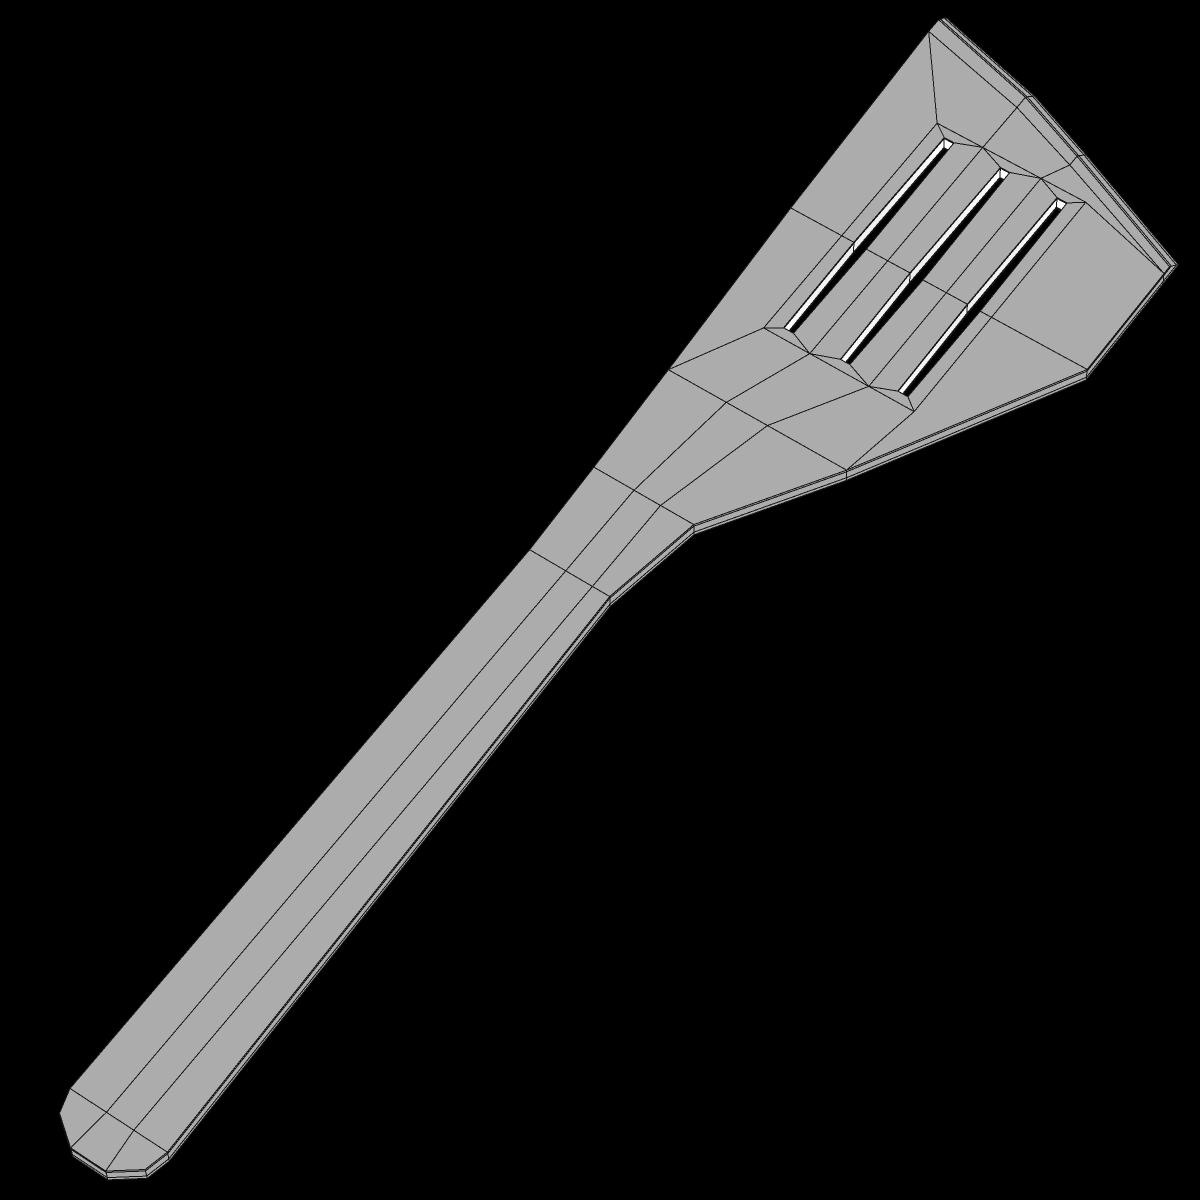 slotted spoon 3d model max fbx c4d ma mb obj 159280